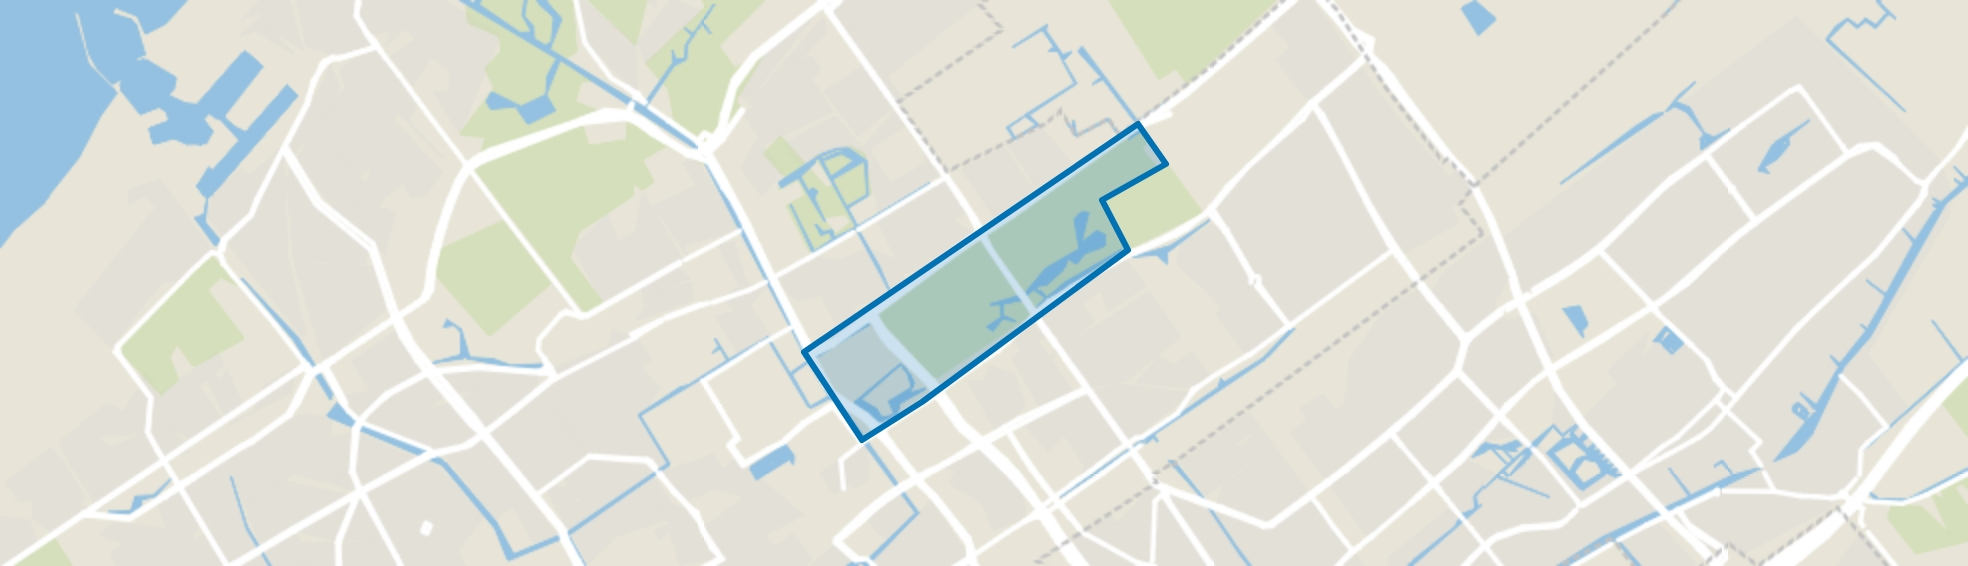 Haagse Bos, Den Haag map